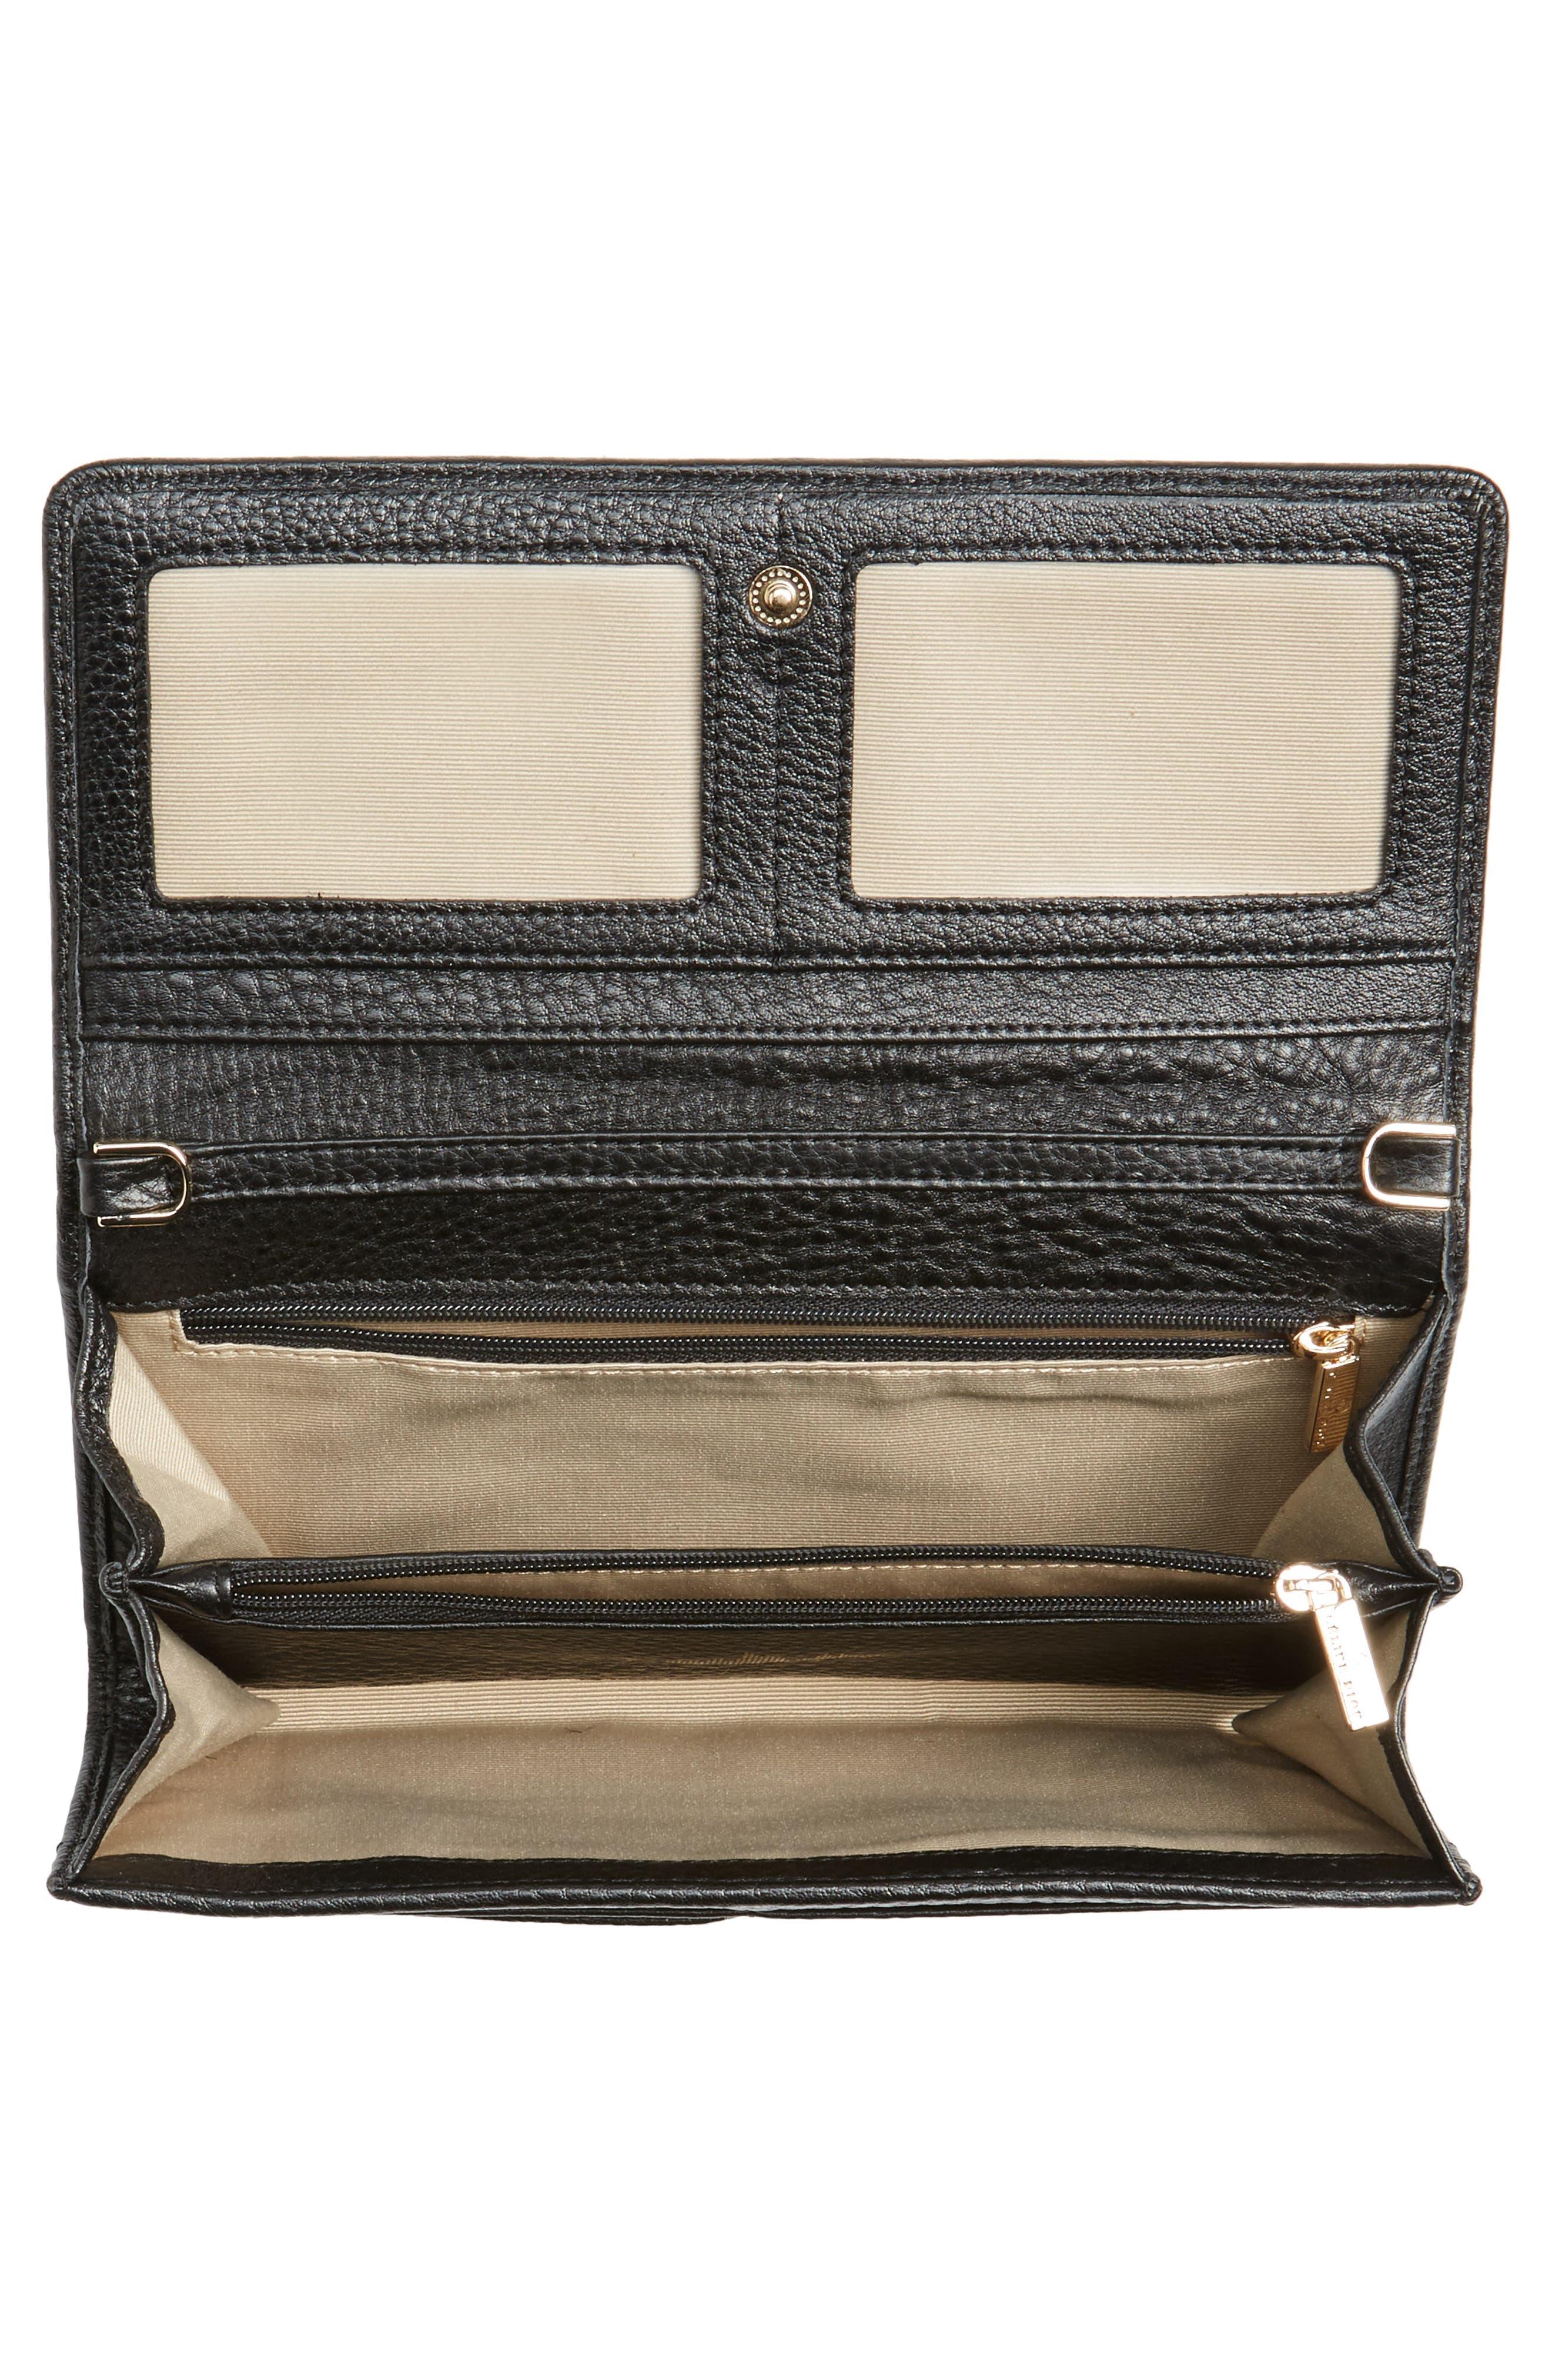 Céline Dion Adagio Leather Crossbody Wallet,                             Alternate thumbnail 5, color,                             001